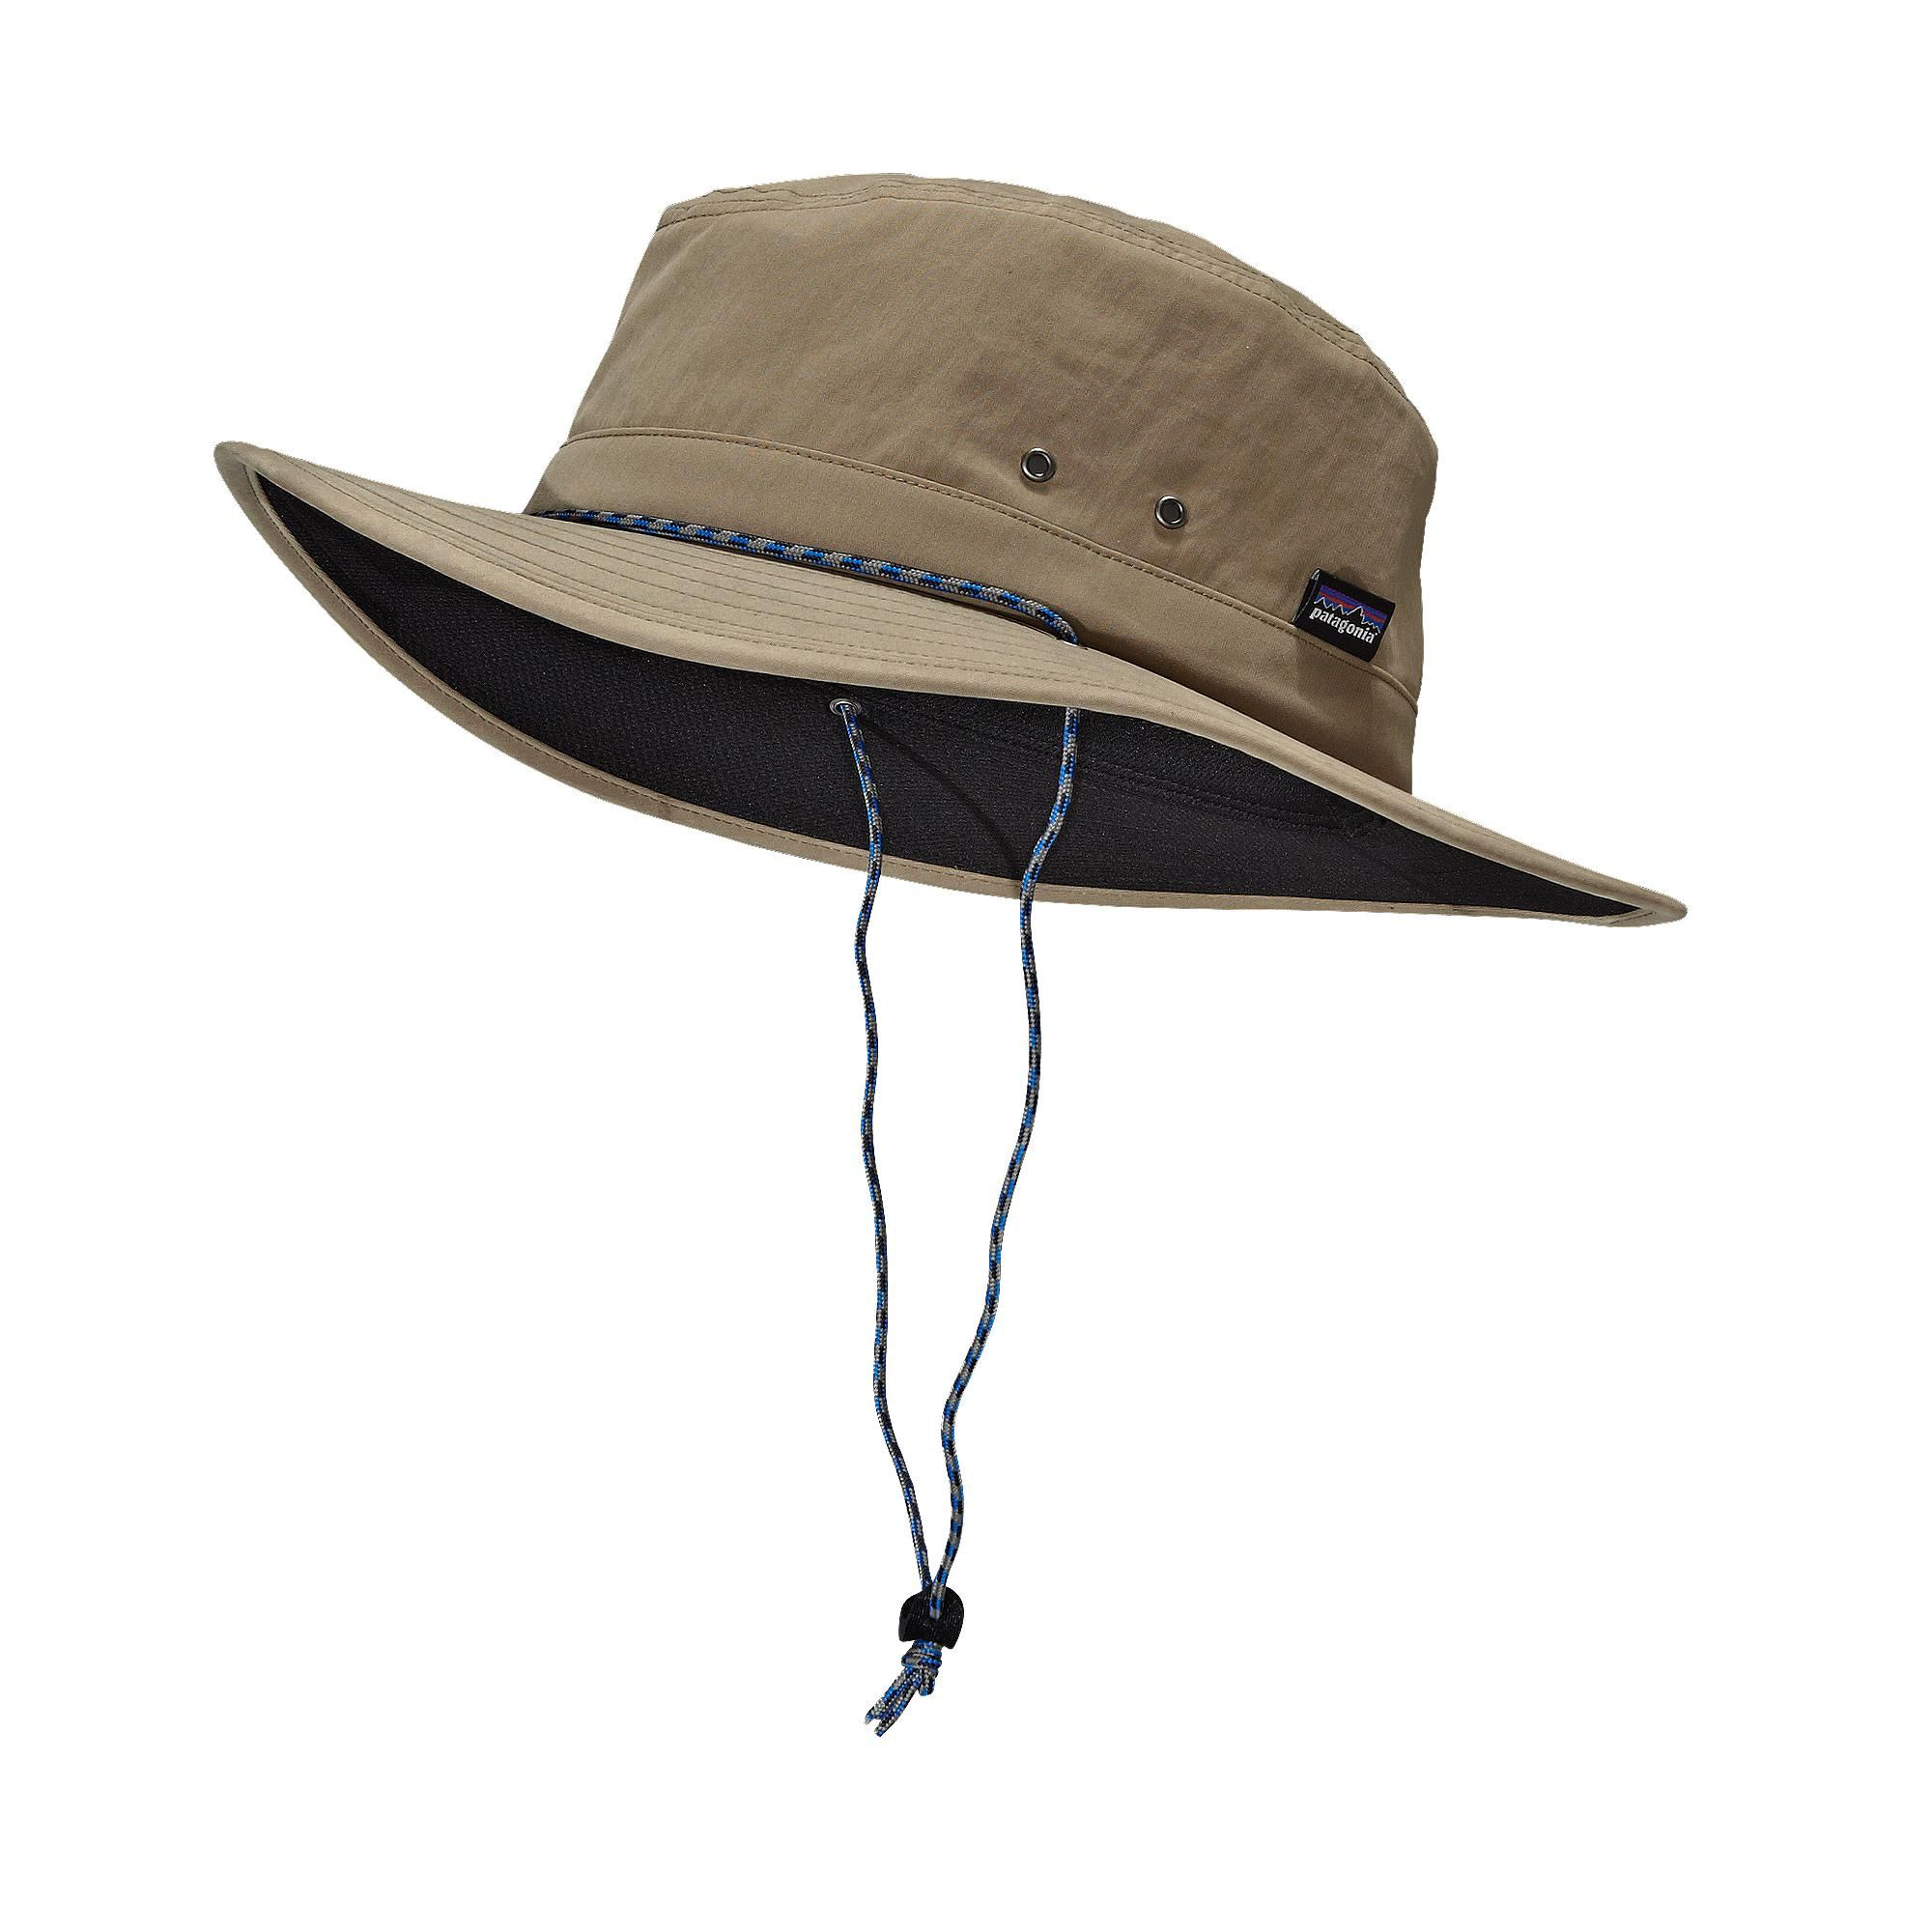 Patagonia Rain Hat: PATAGONIA TENPENNY HAT ($39)